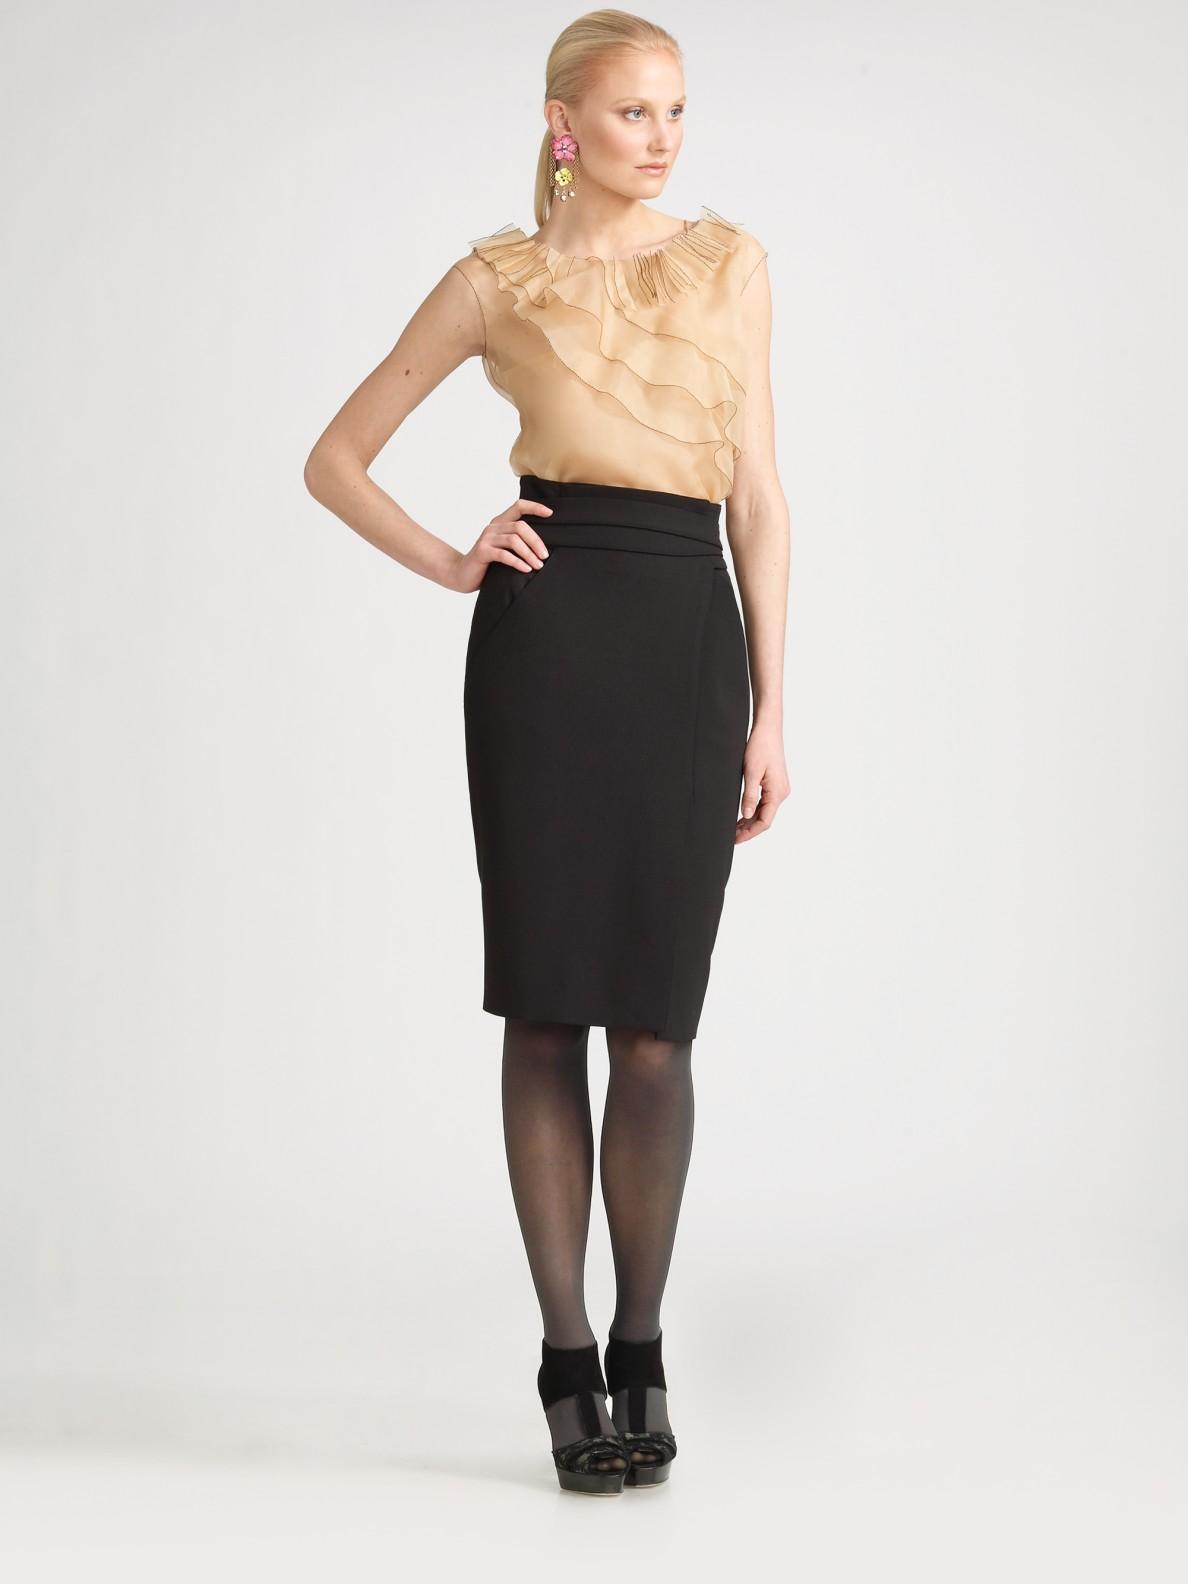 lyst oscar de la renta sleeveless silk organza blouse in natural. Black Bedroom Furniture Sets. Home Design Ideas